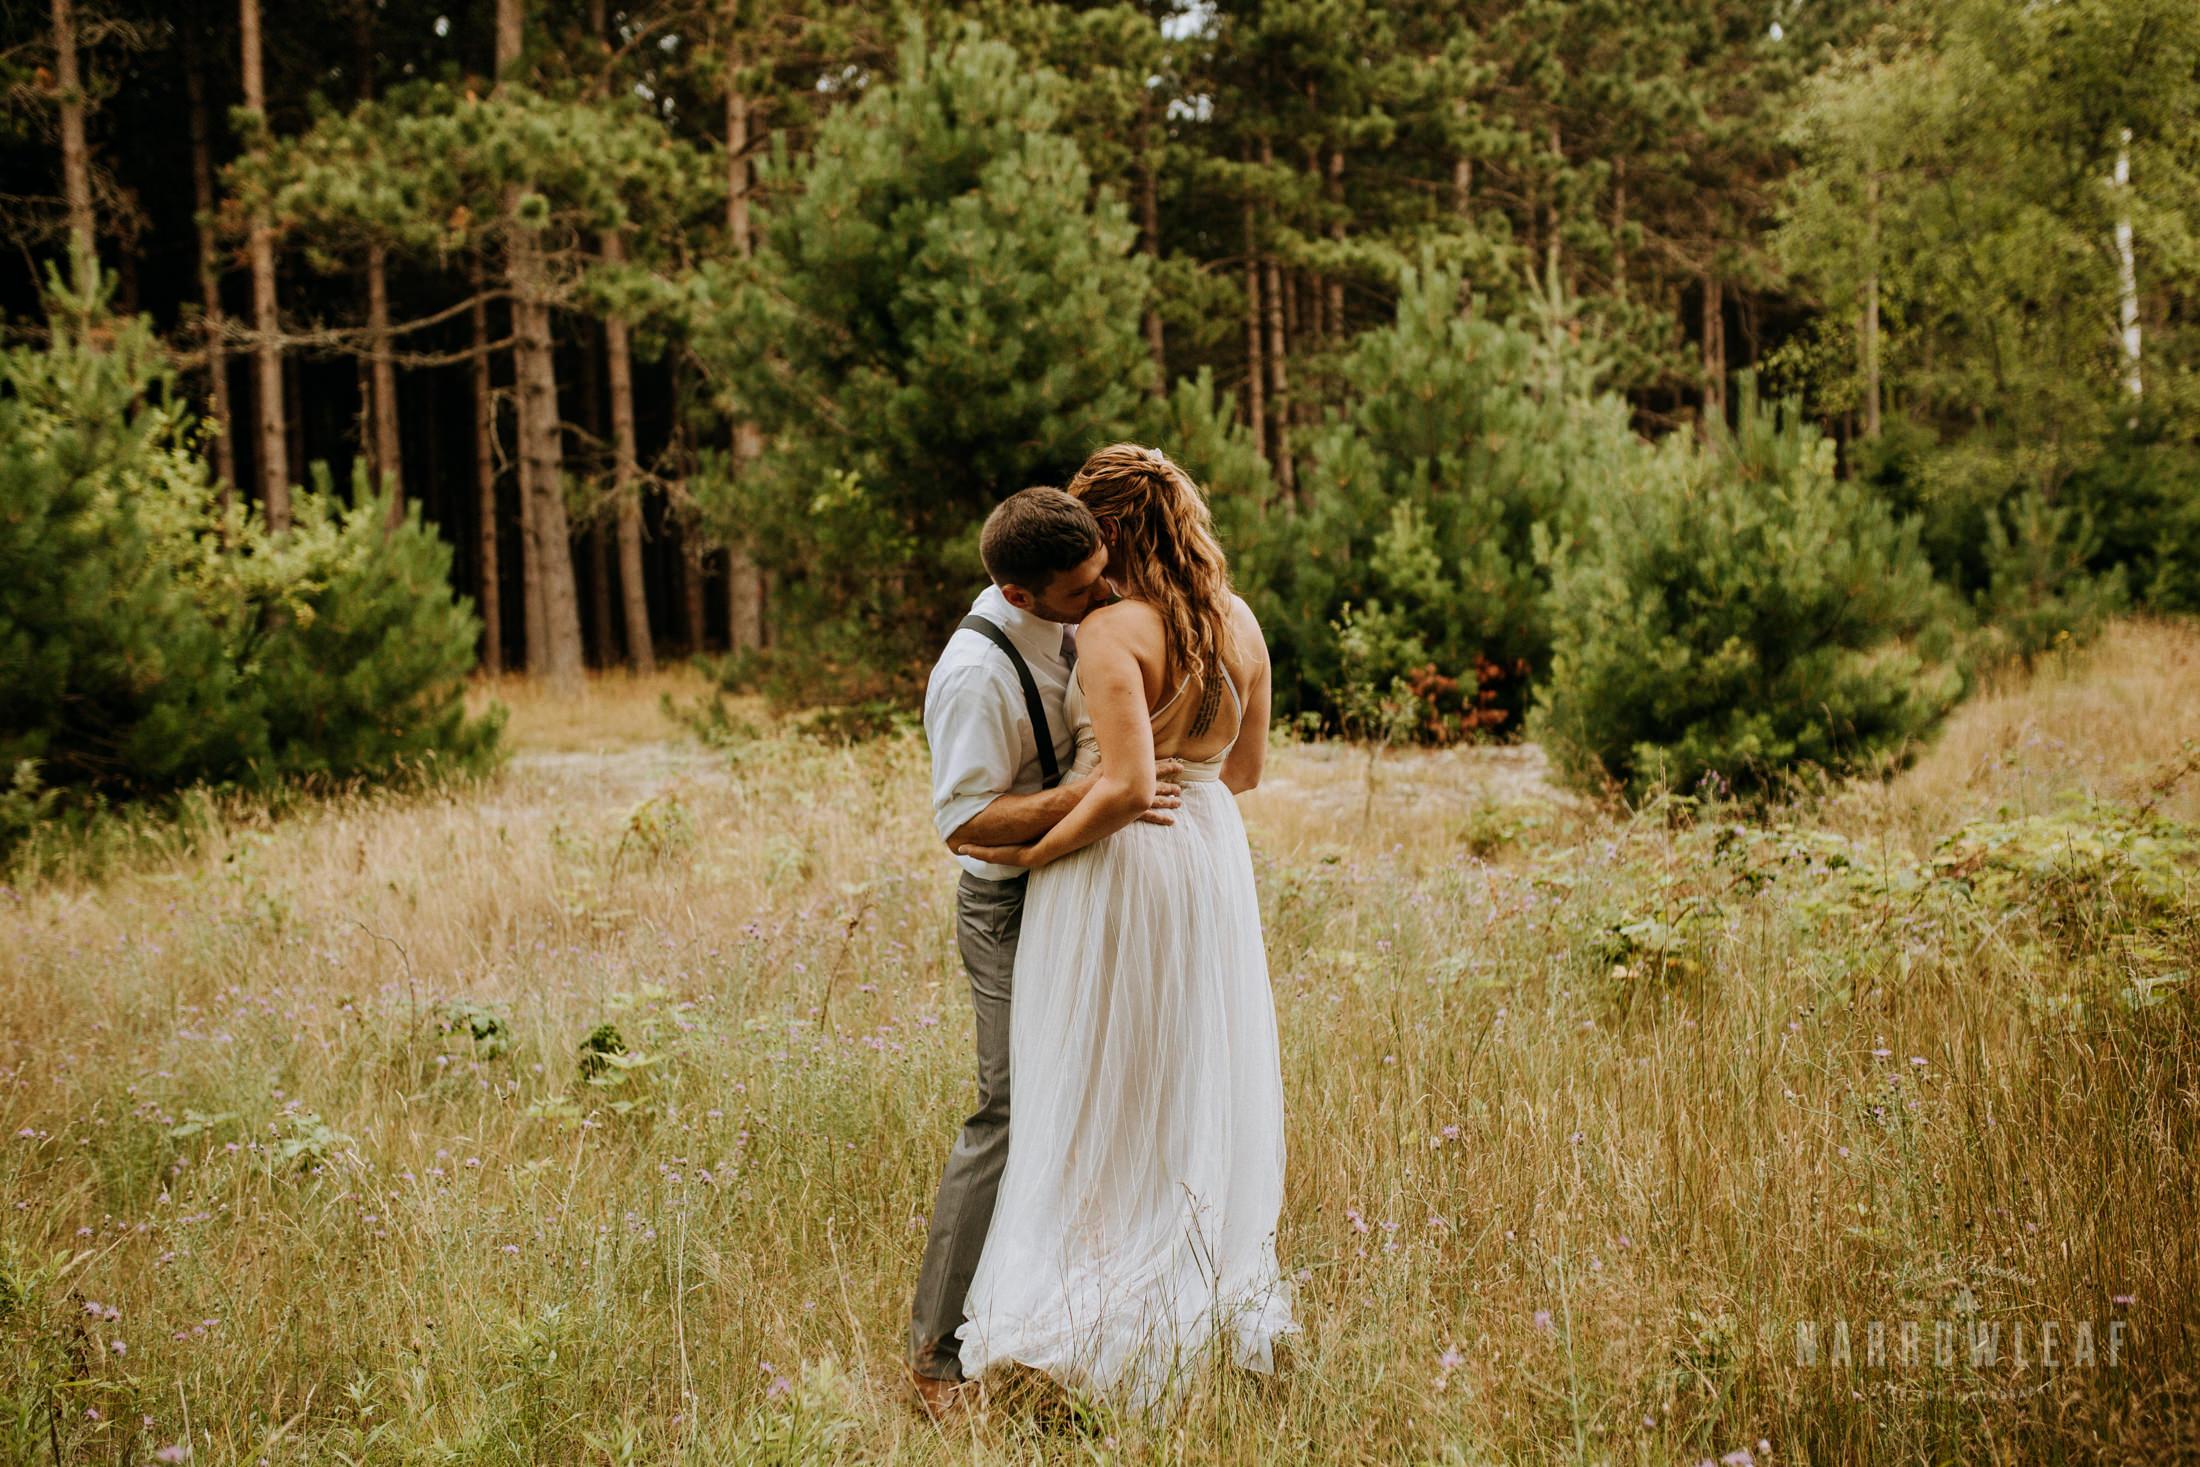 door-county-wedding-photographer-in-the-woods-Narrowleaf_Love_and_Adventure_Photography-9481.jpg